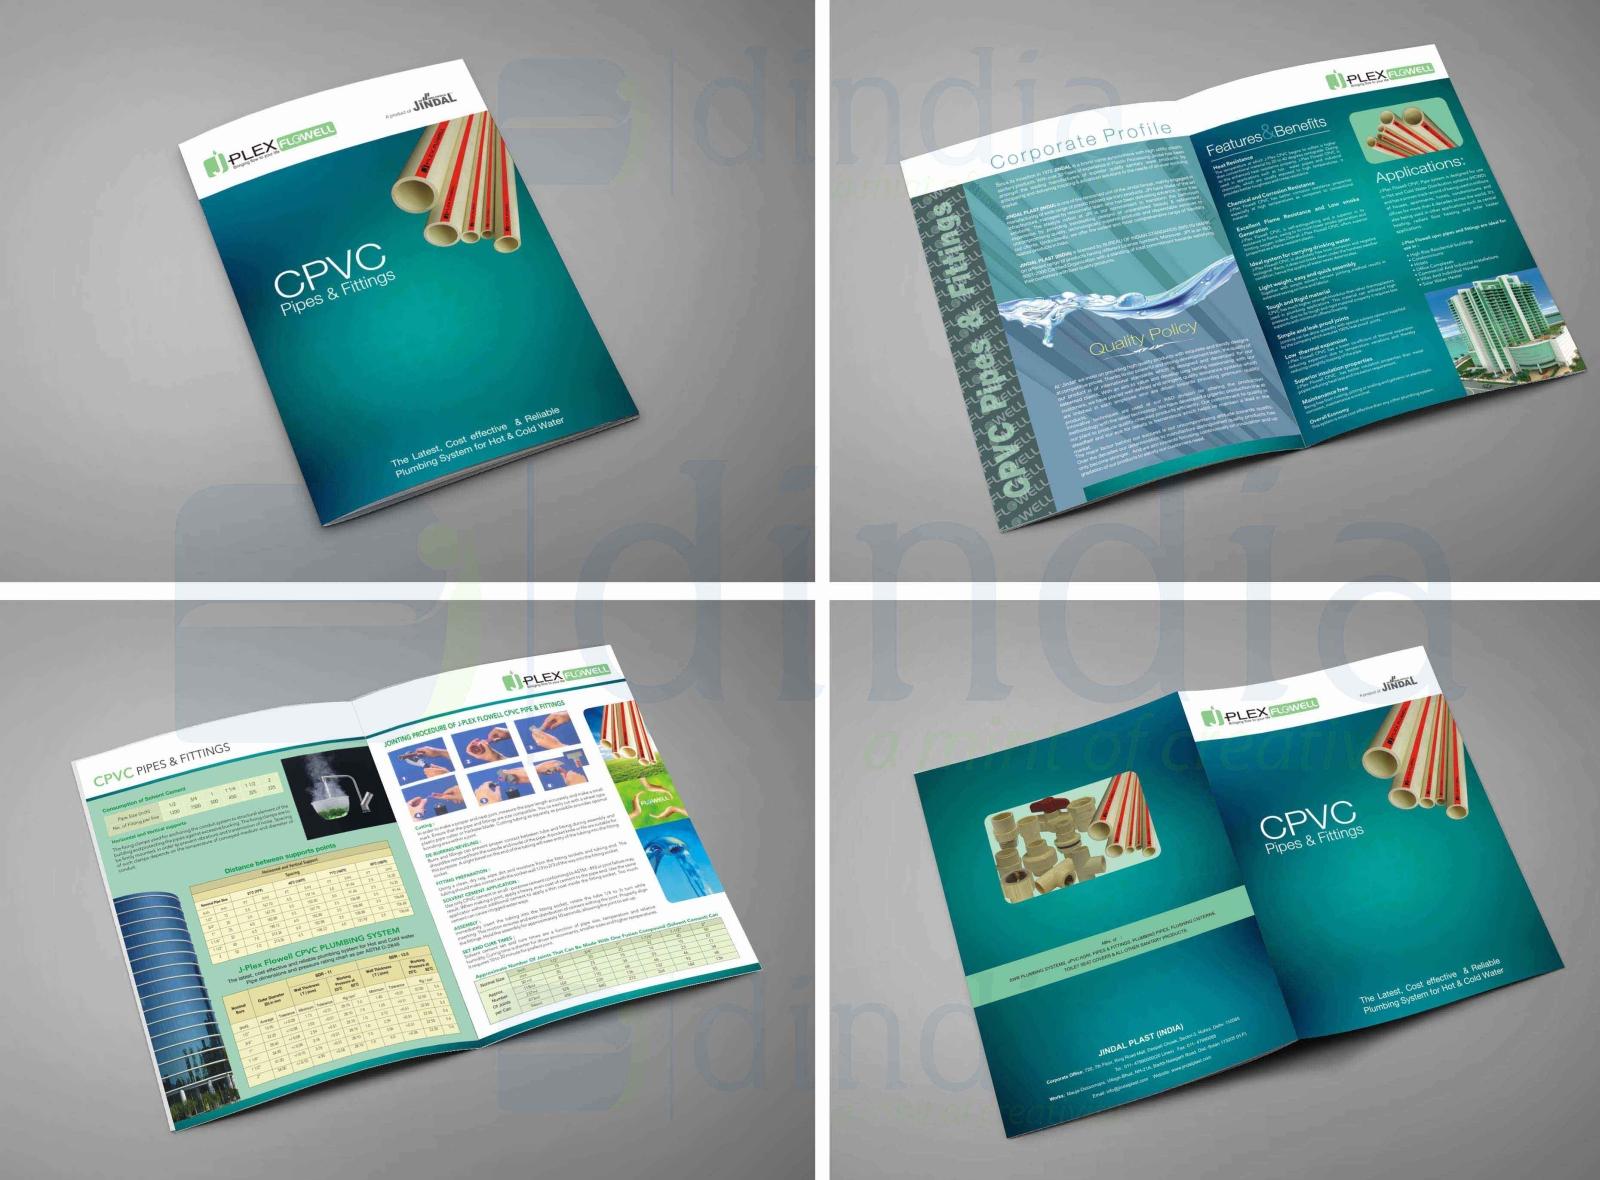 Product Brochure And Catalog Design By Raju Yadav On Dribbble